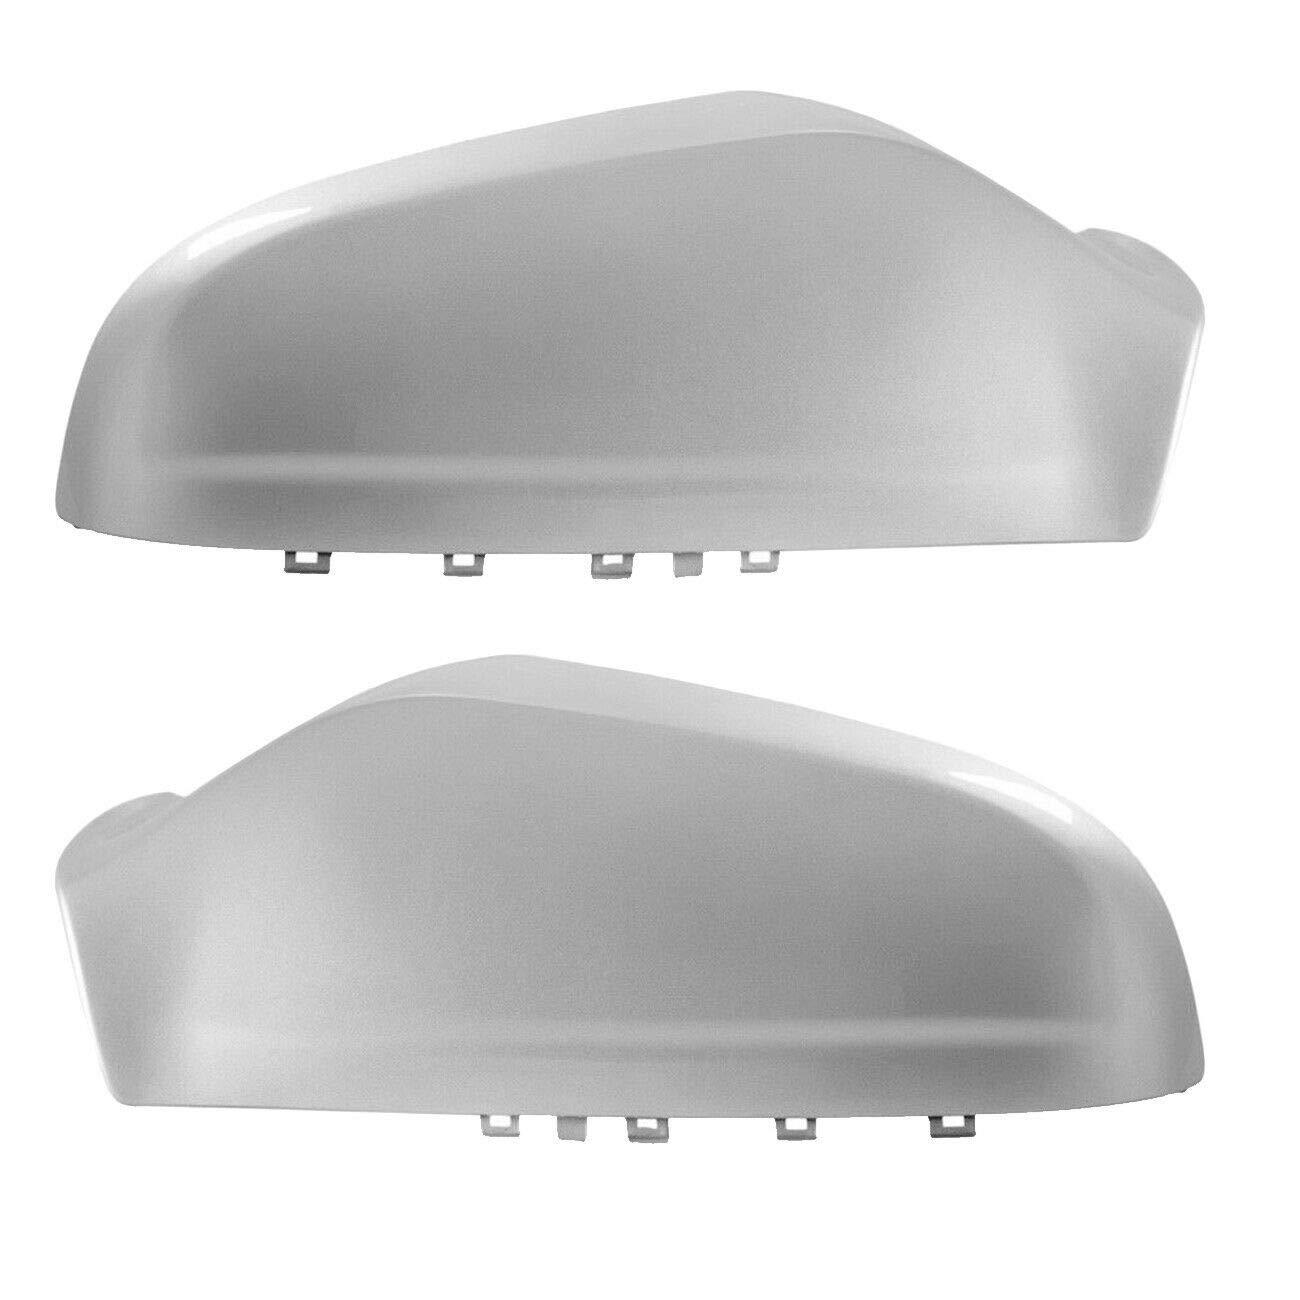 Spiegelkappen Silber zum Austausch MASO Spiegelkappen ausgetauscht Rechts Fiesta 2009~2015